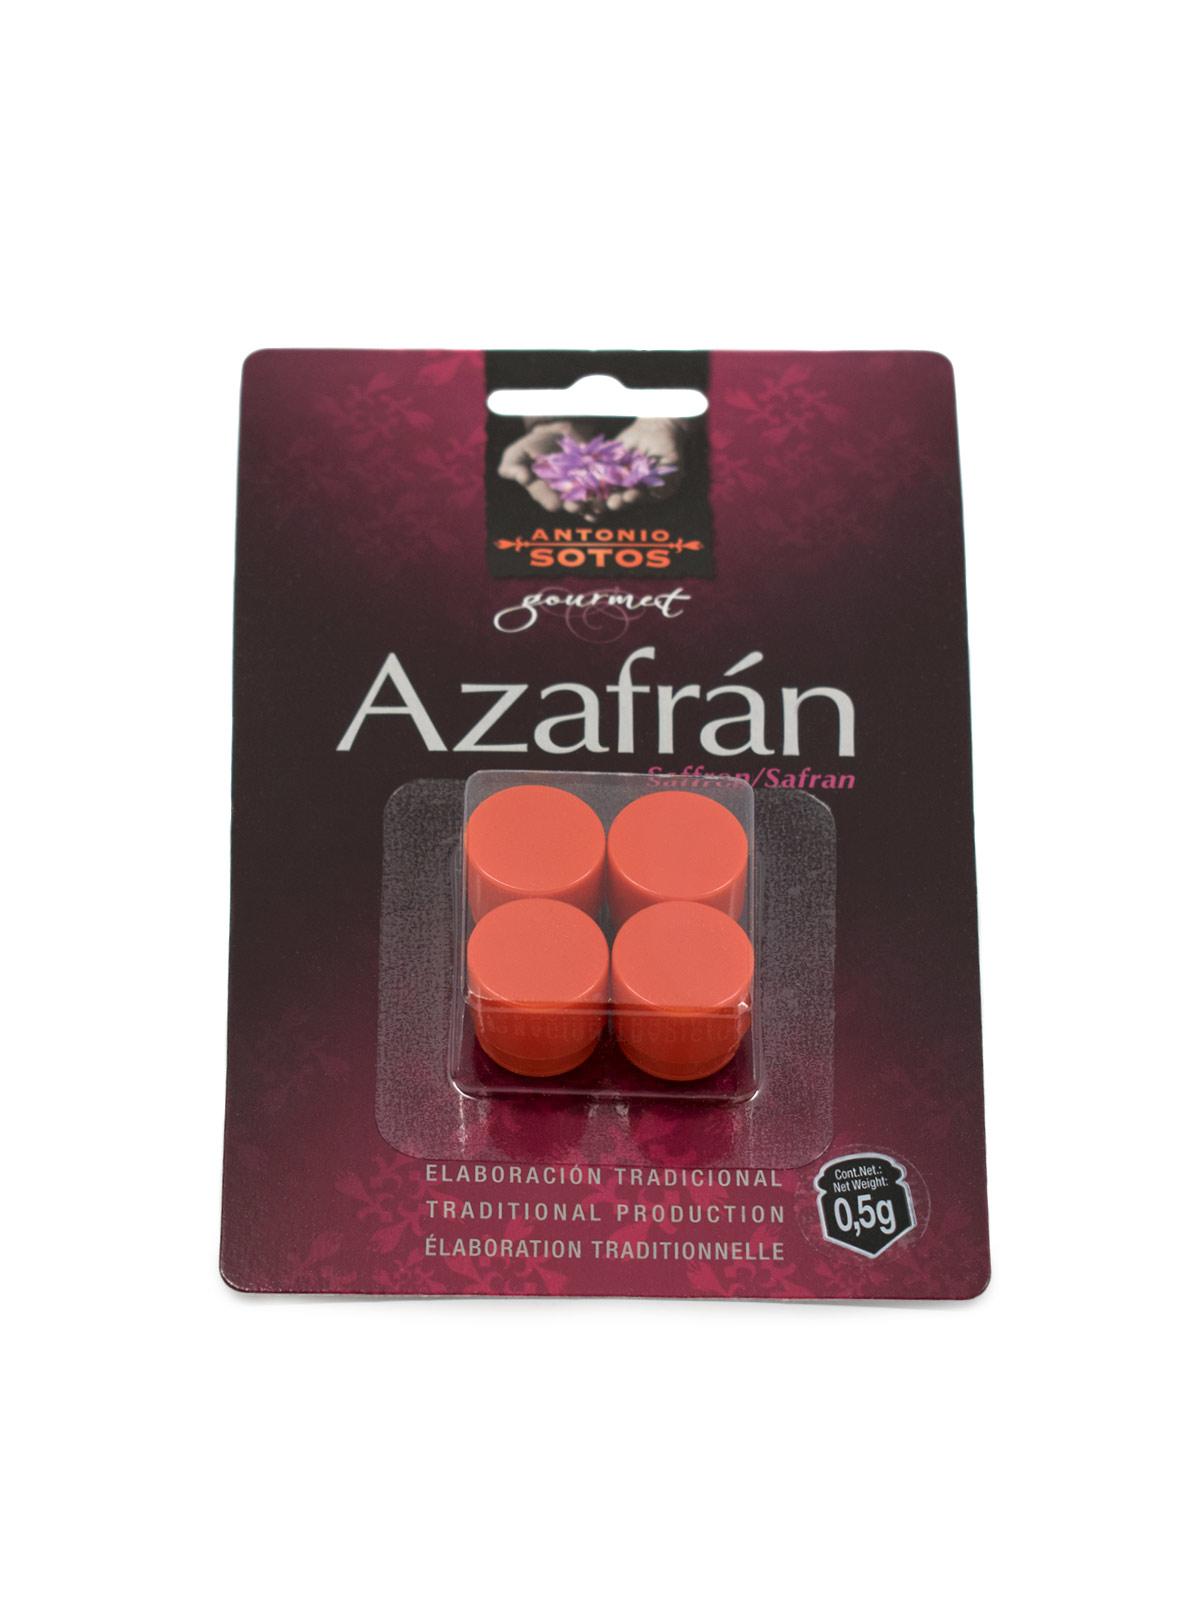 Gourmet Saffron (Blister Capsules) - Pantry - Buon'Italia